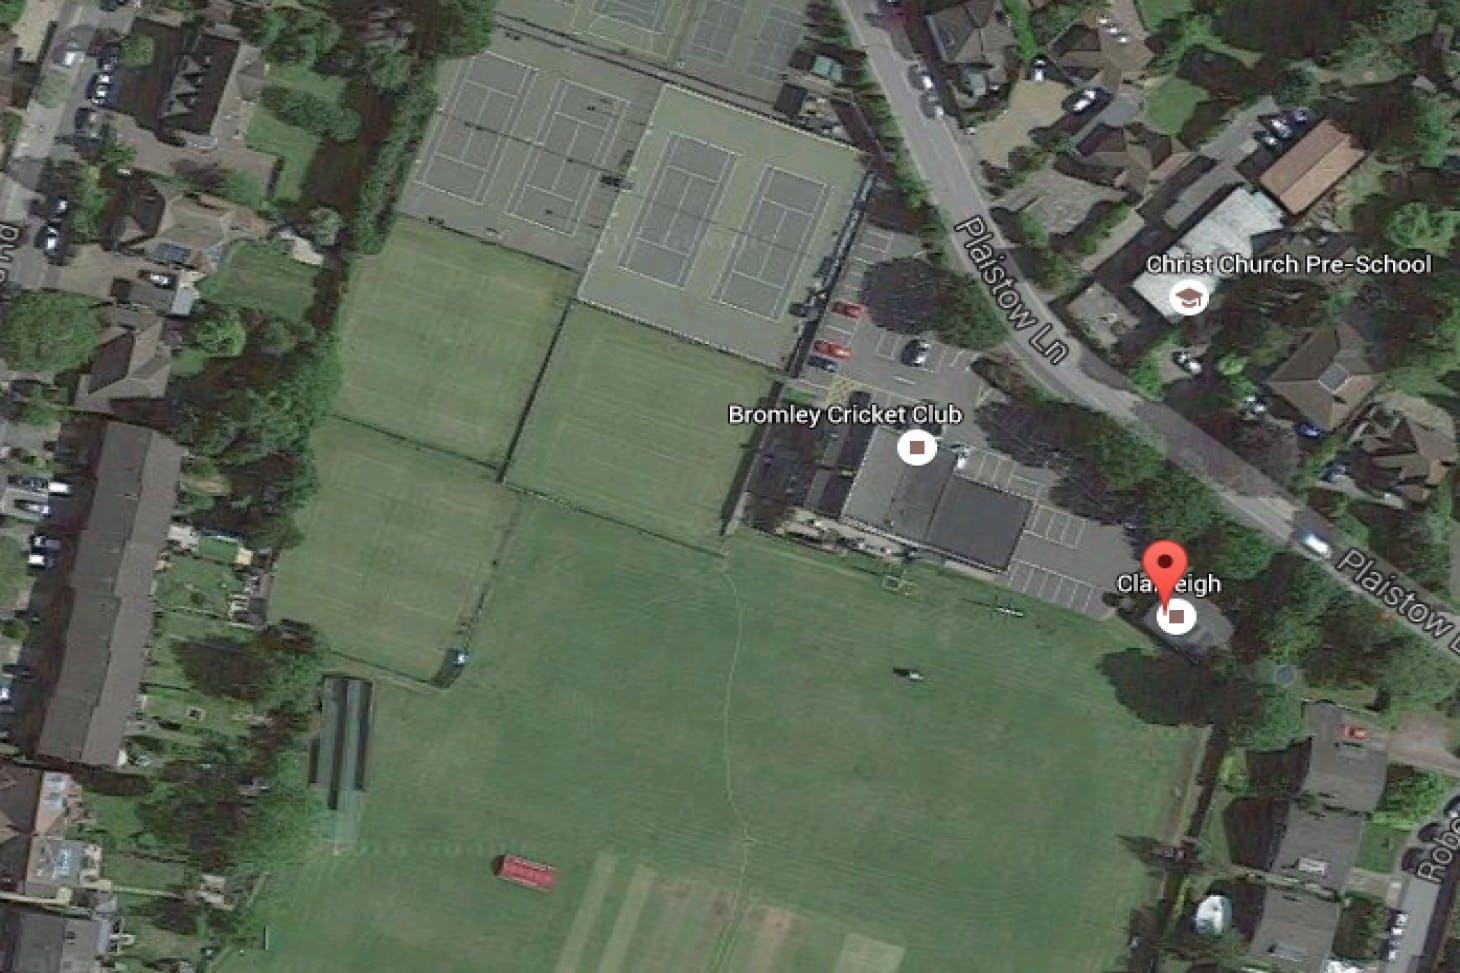 Bromley Cricket Club Indoor | Hard squash court